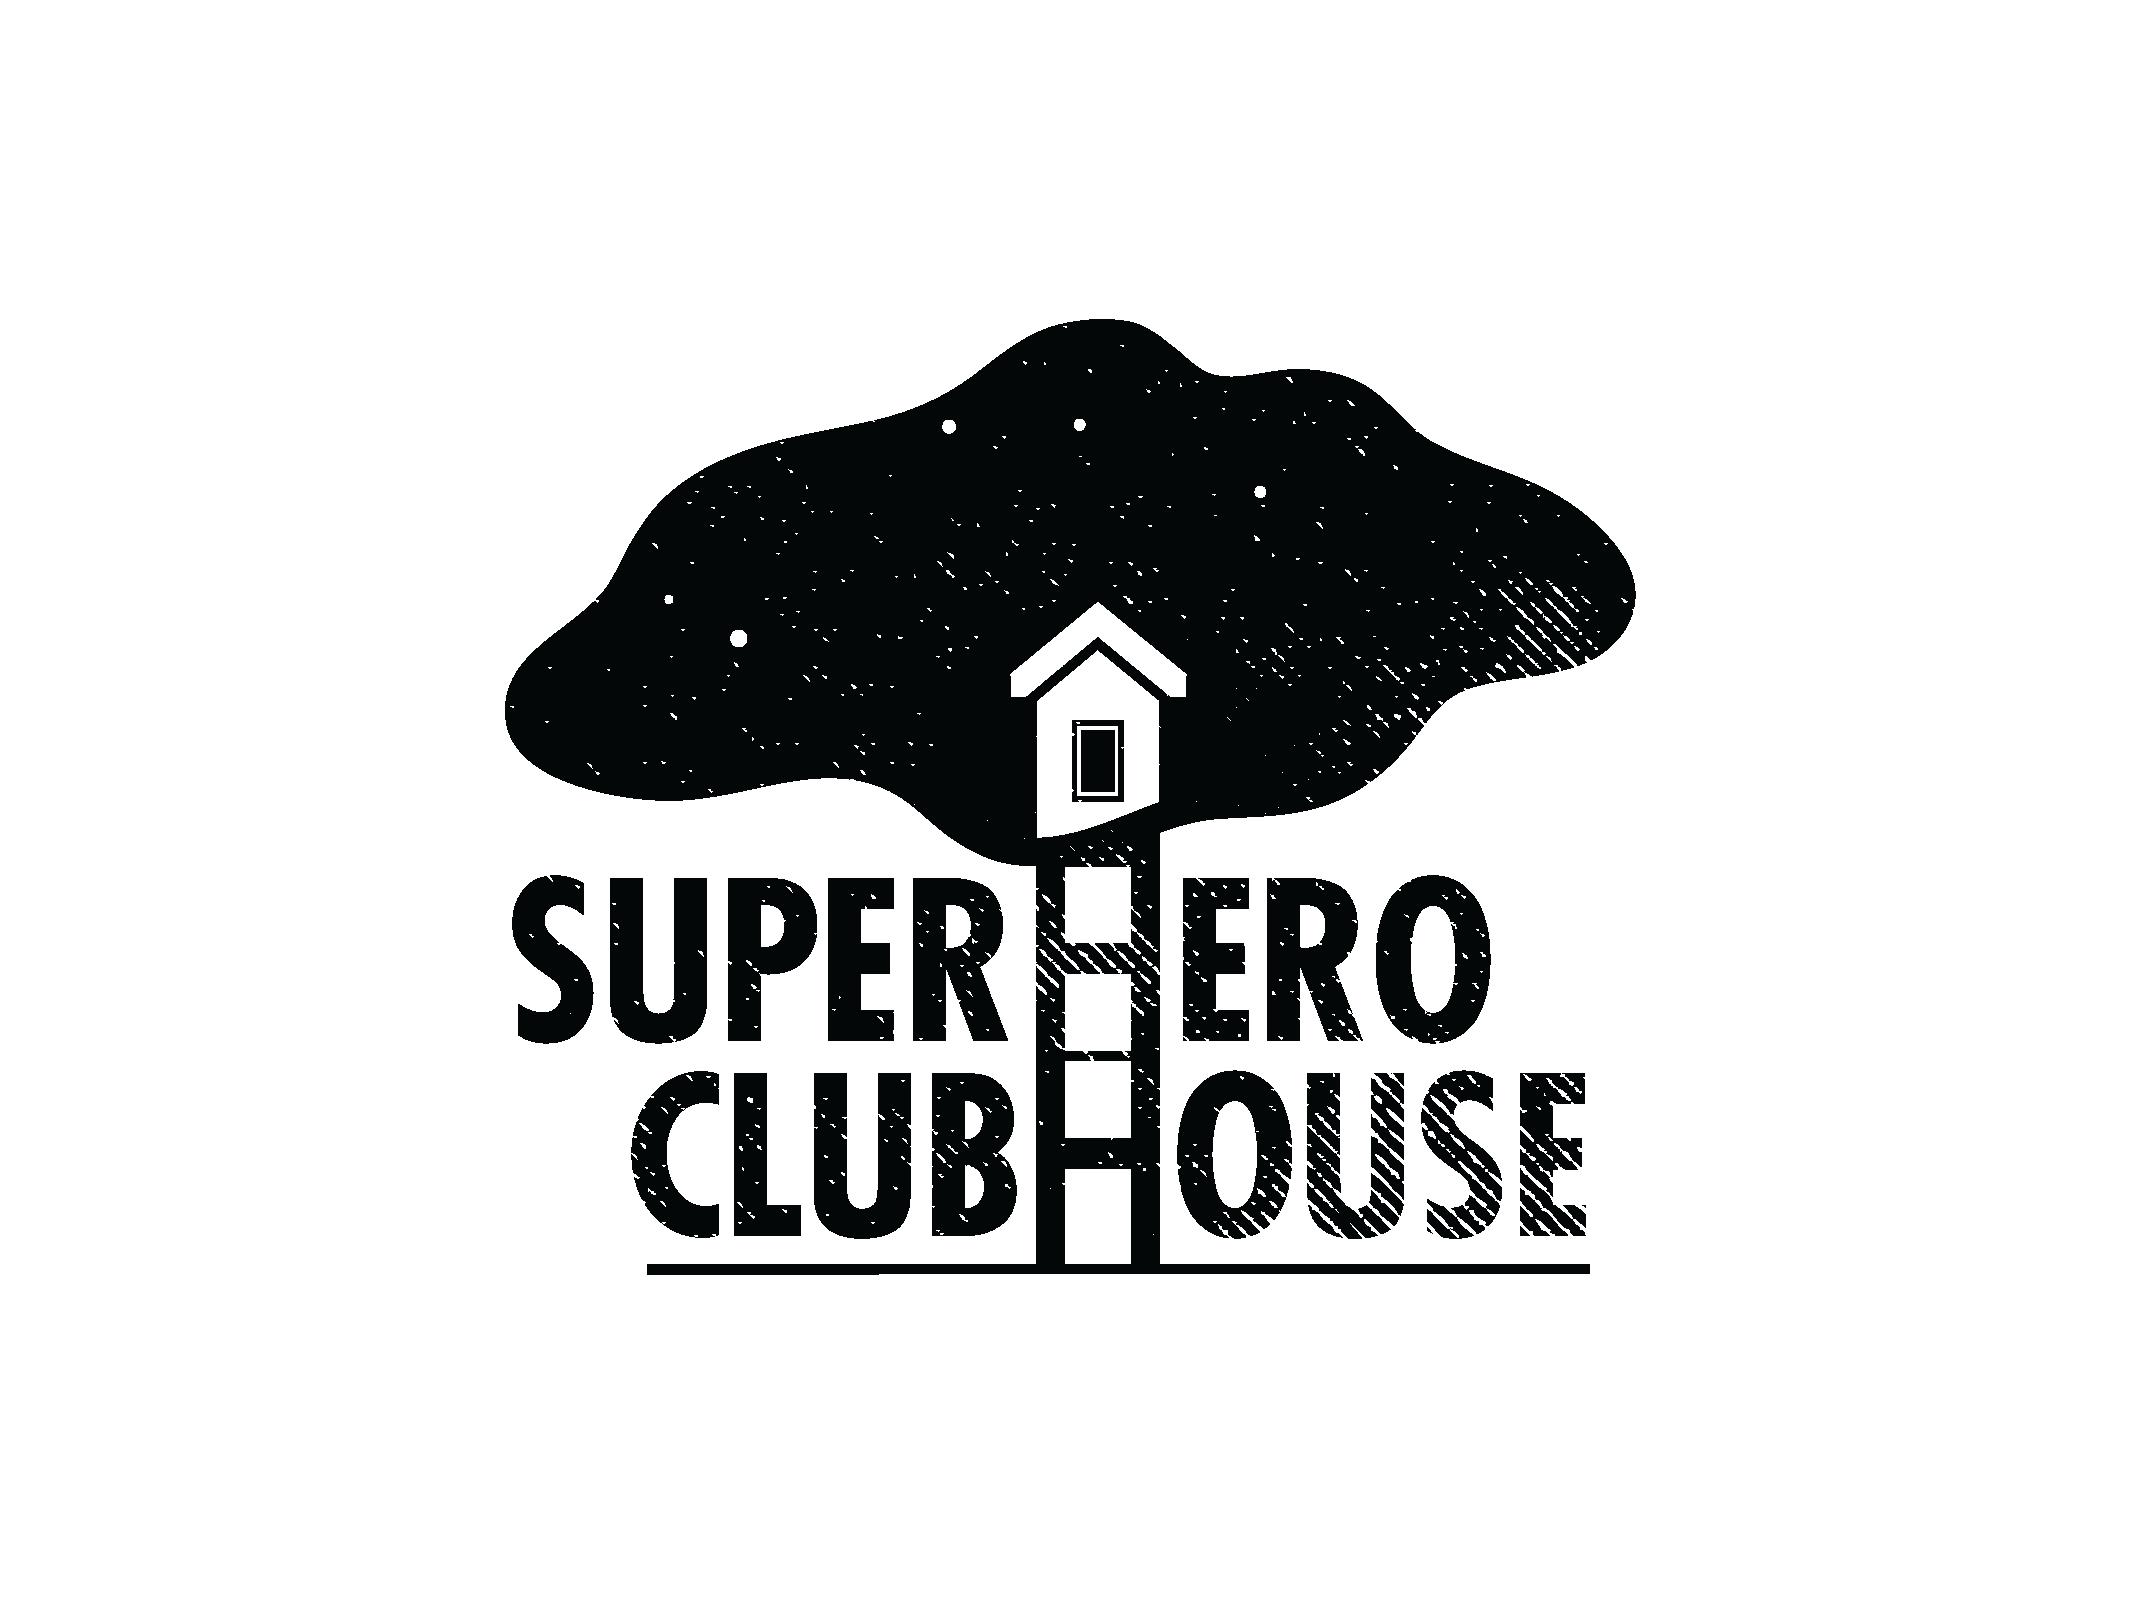 SC_logo_2015_black_full_texture_mid (1).png